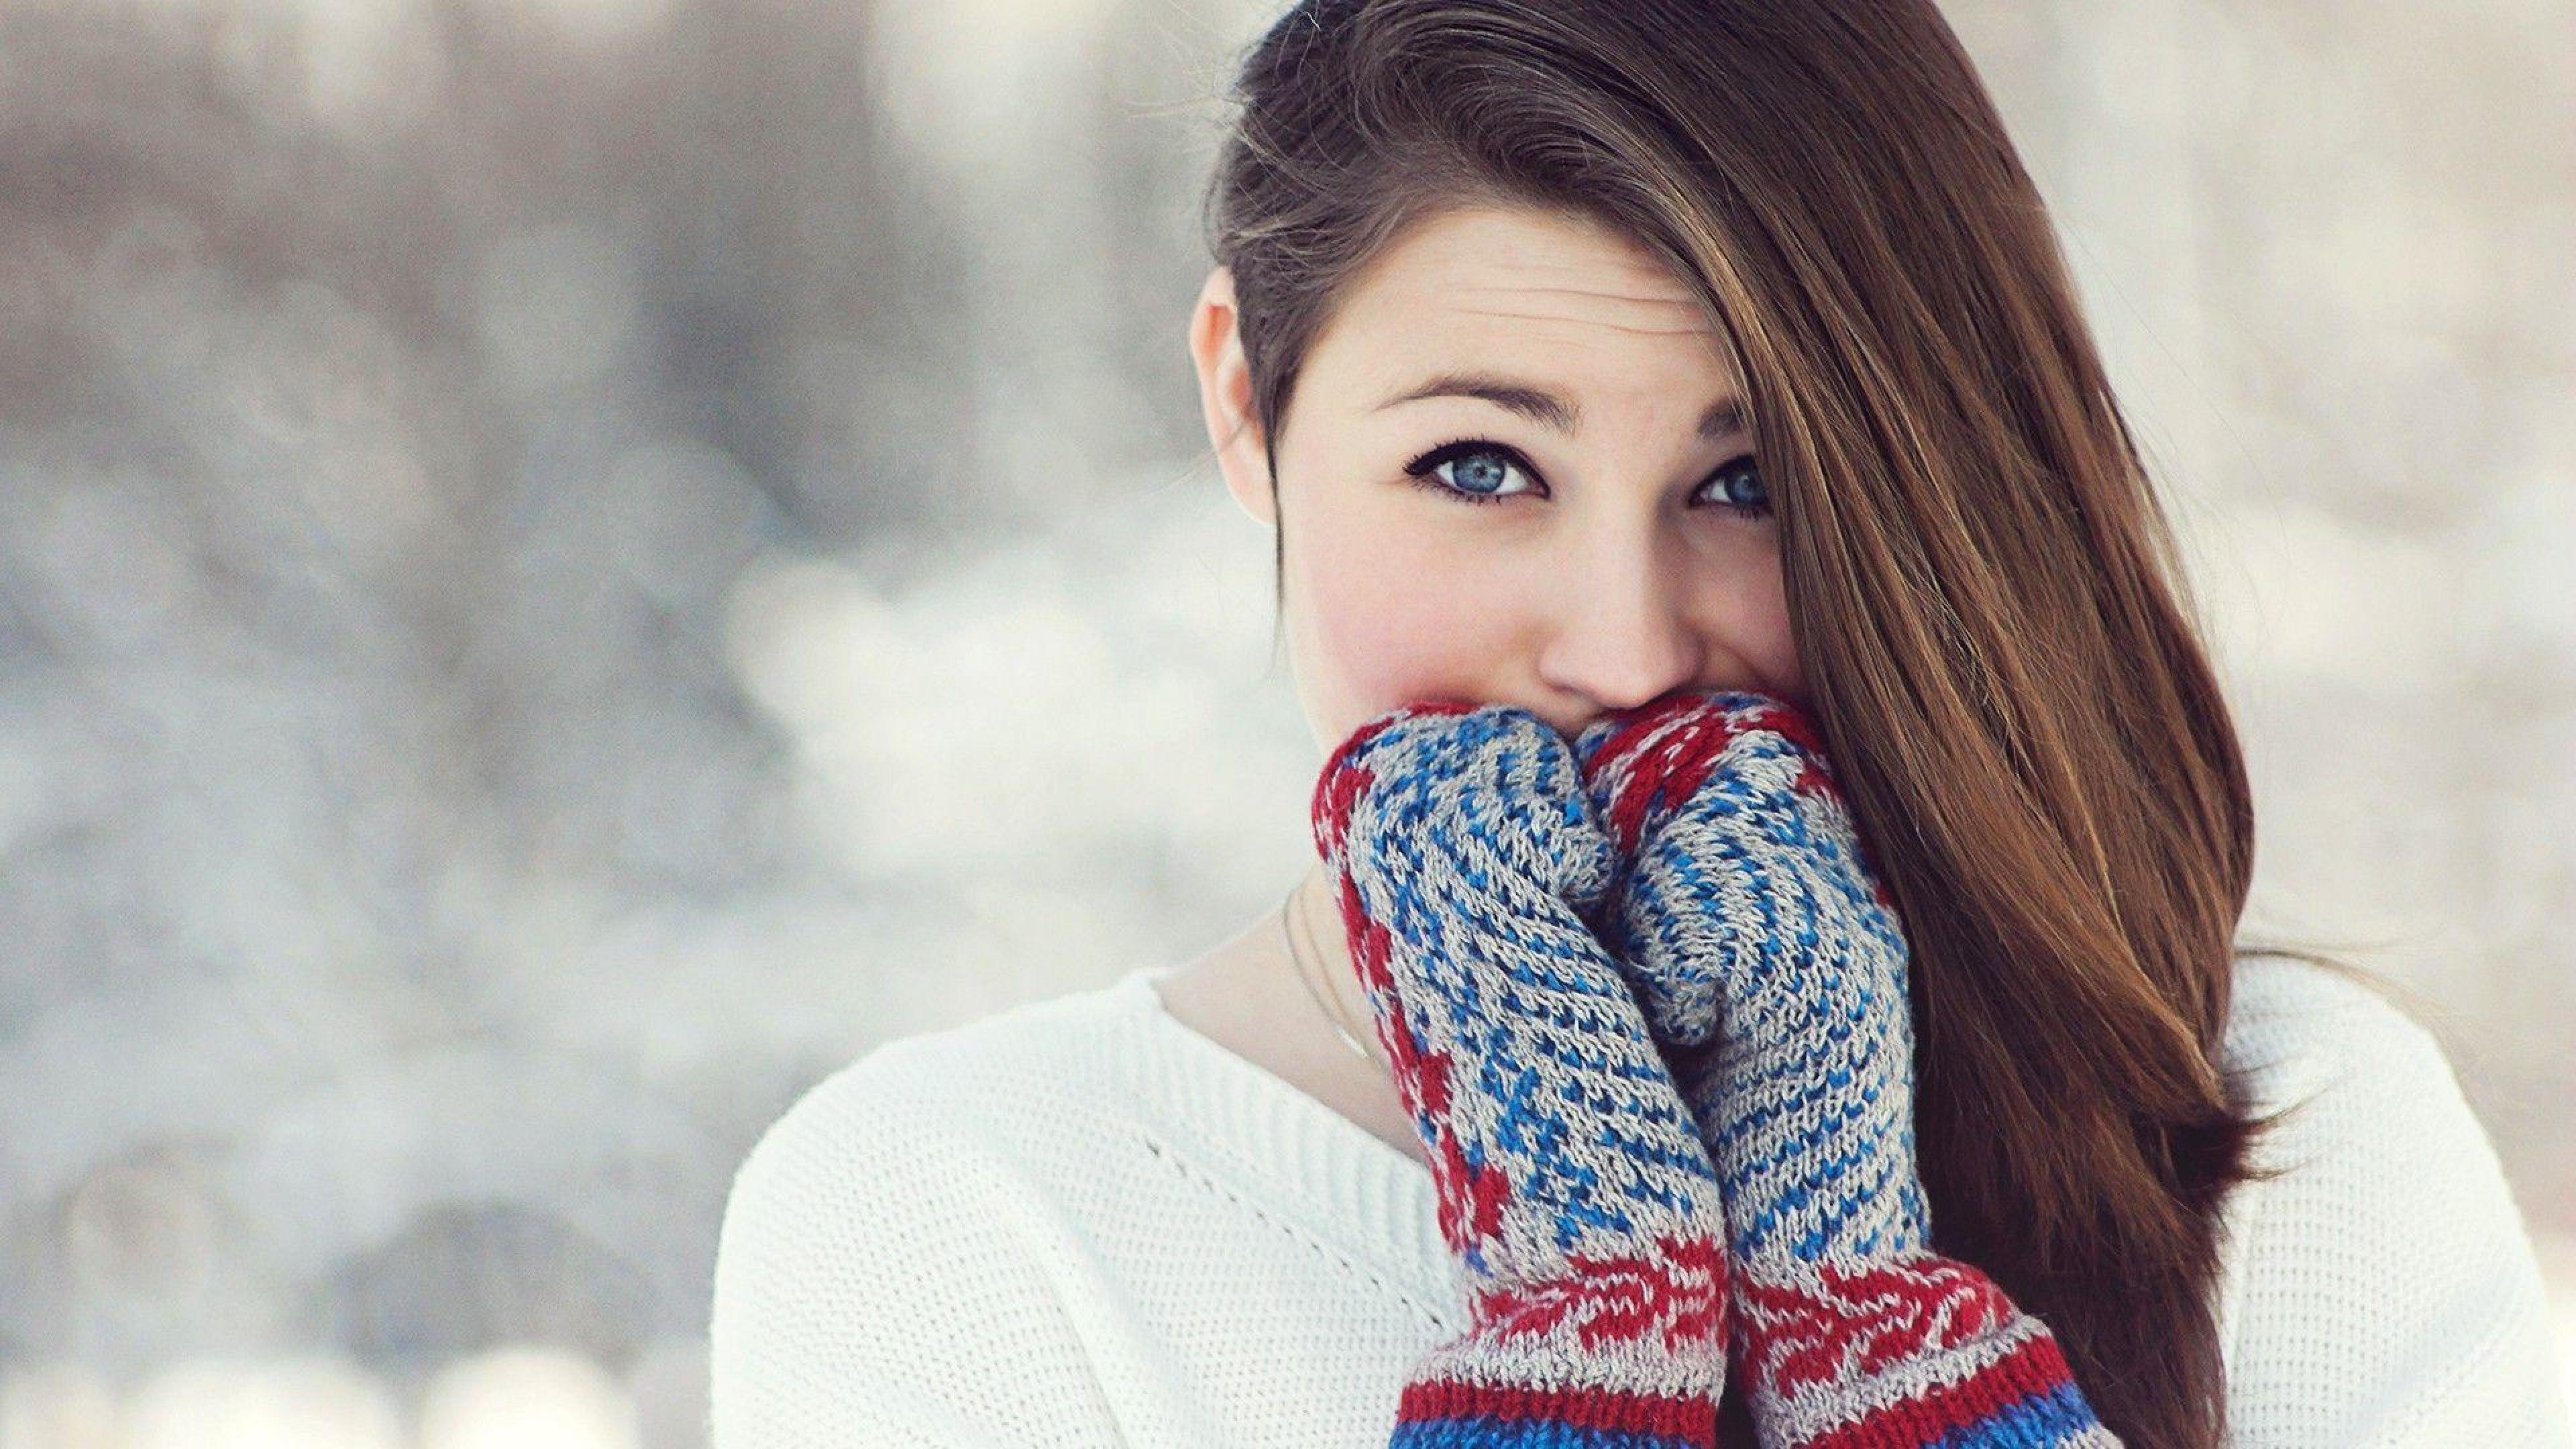 Winter girl wallpapers images photos pictures backgrounds - Gir desktop wallpaper ...